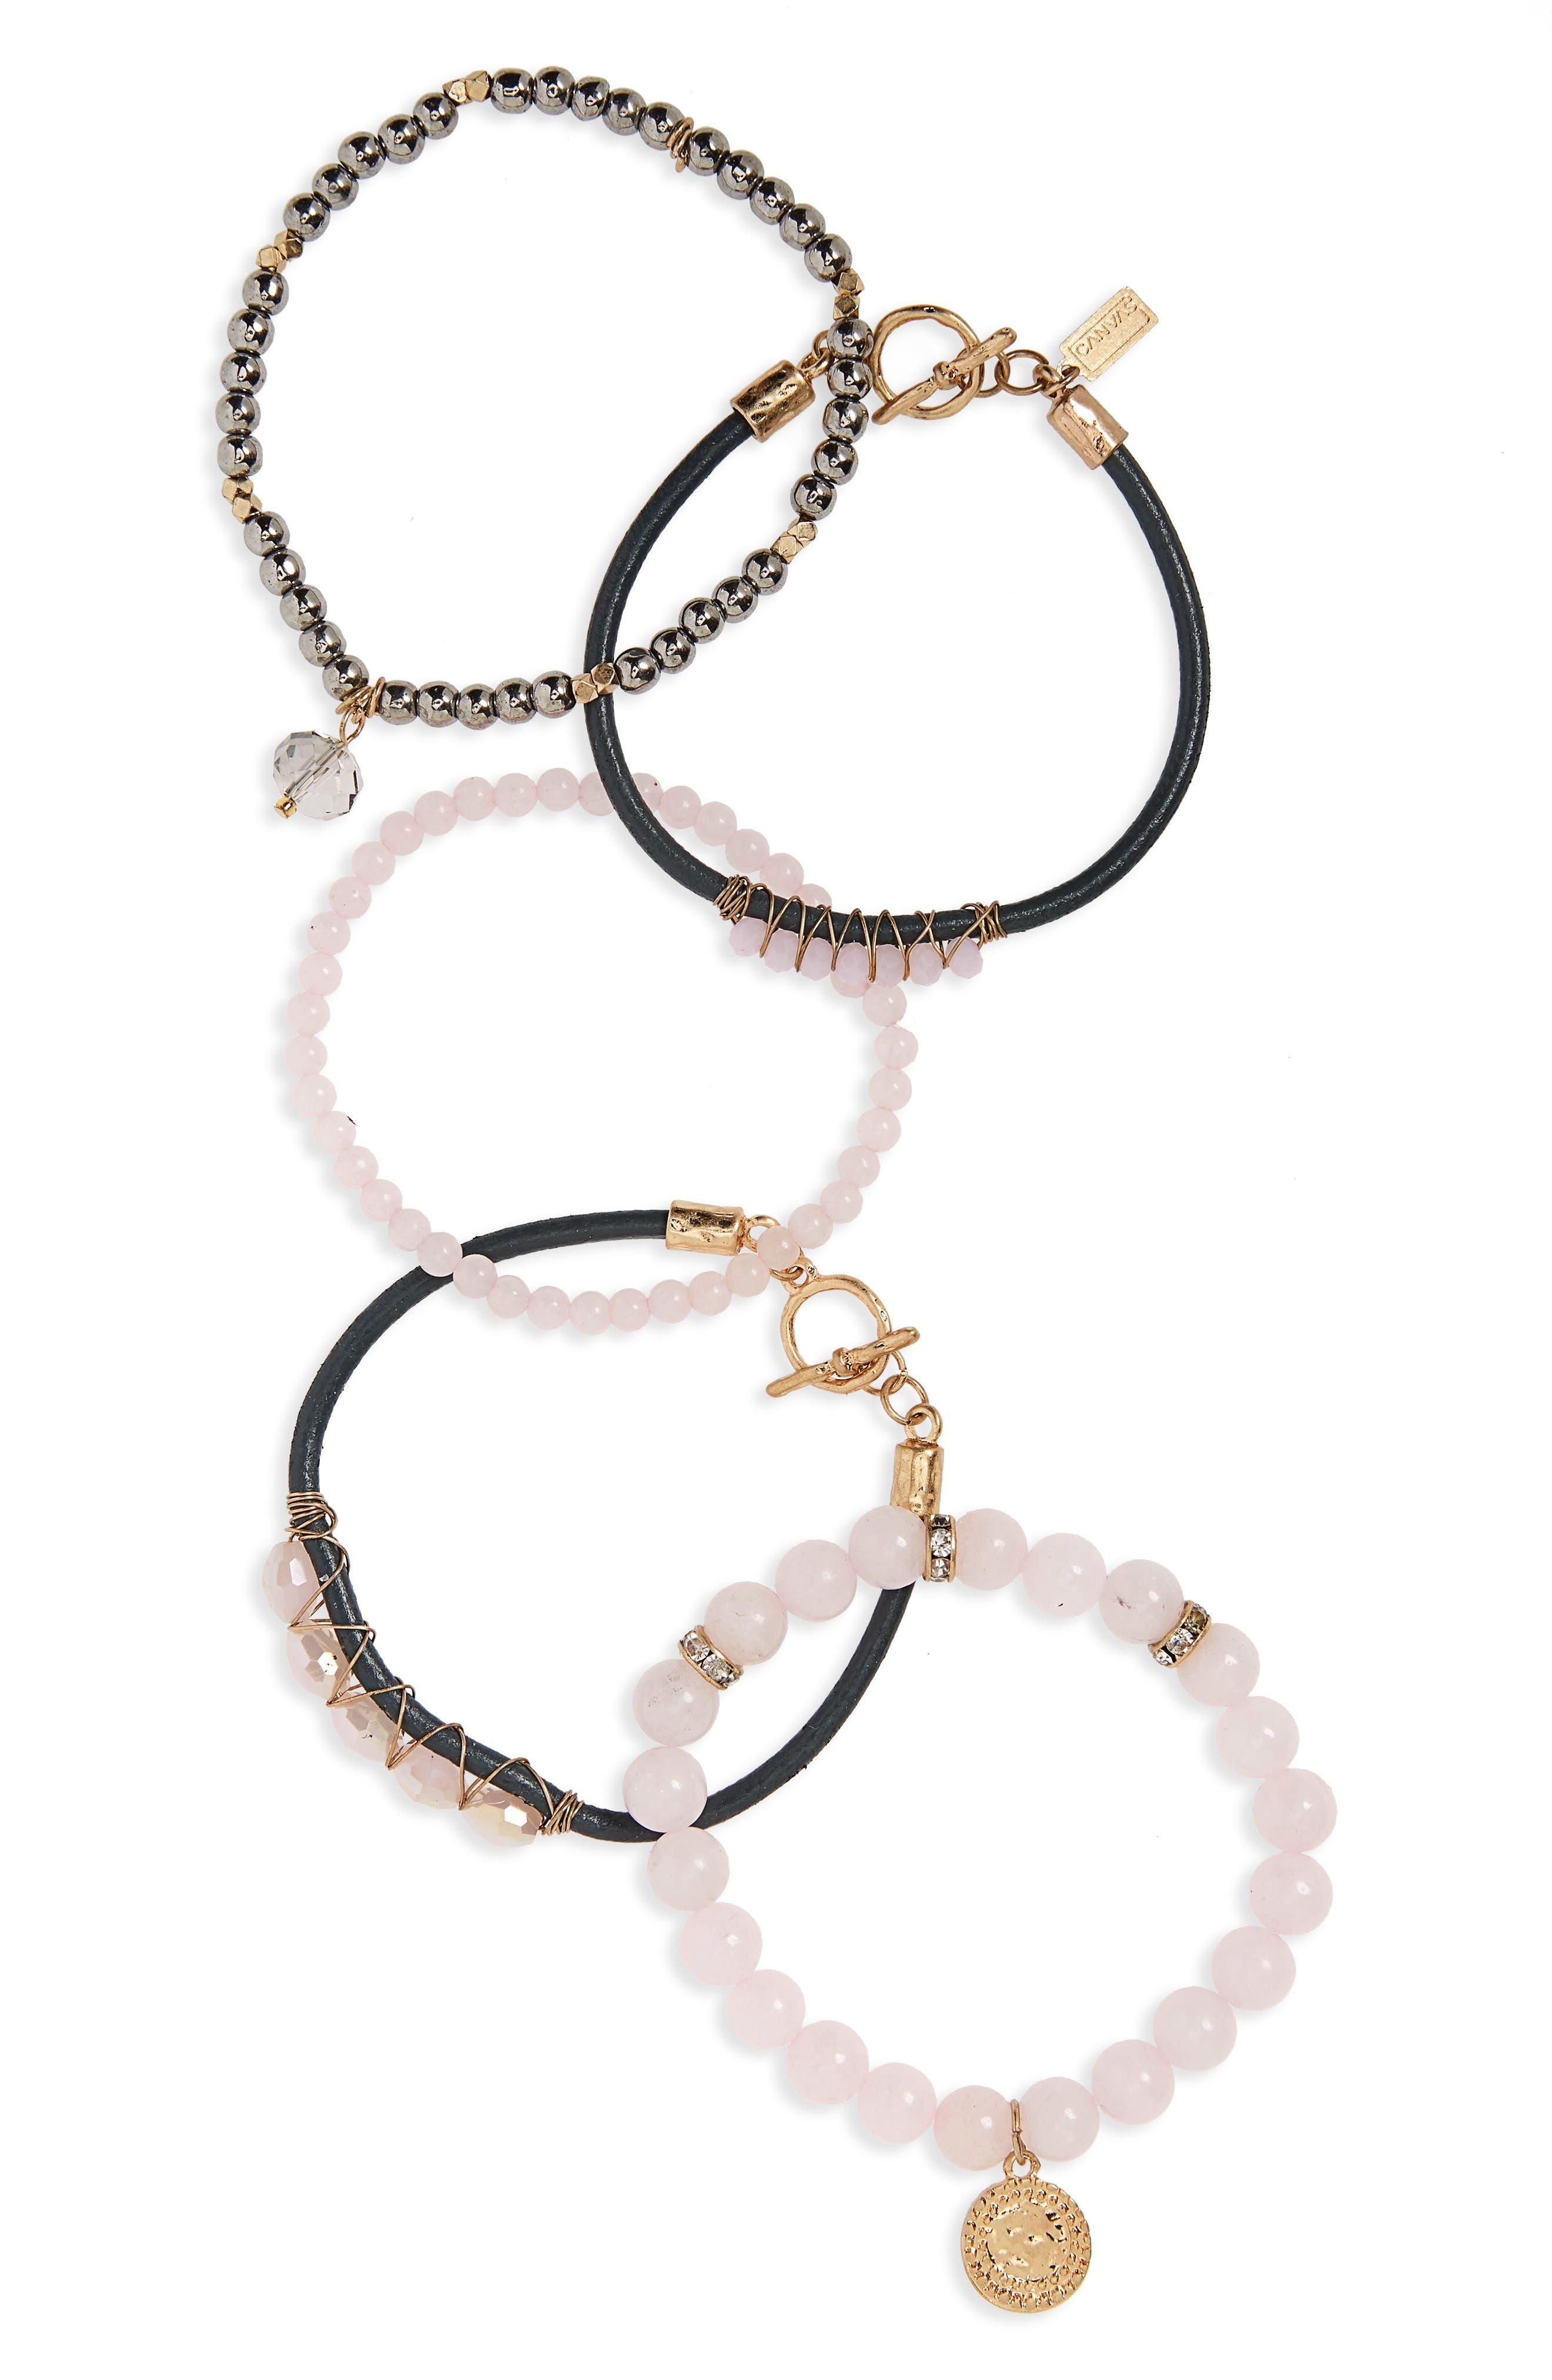 5-Piece Semiprecious Stone Stacking Bracelet,                             Main thumbnail 1, color,                             Pink